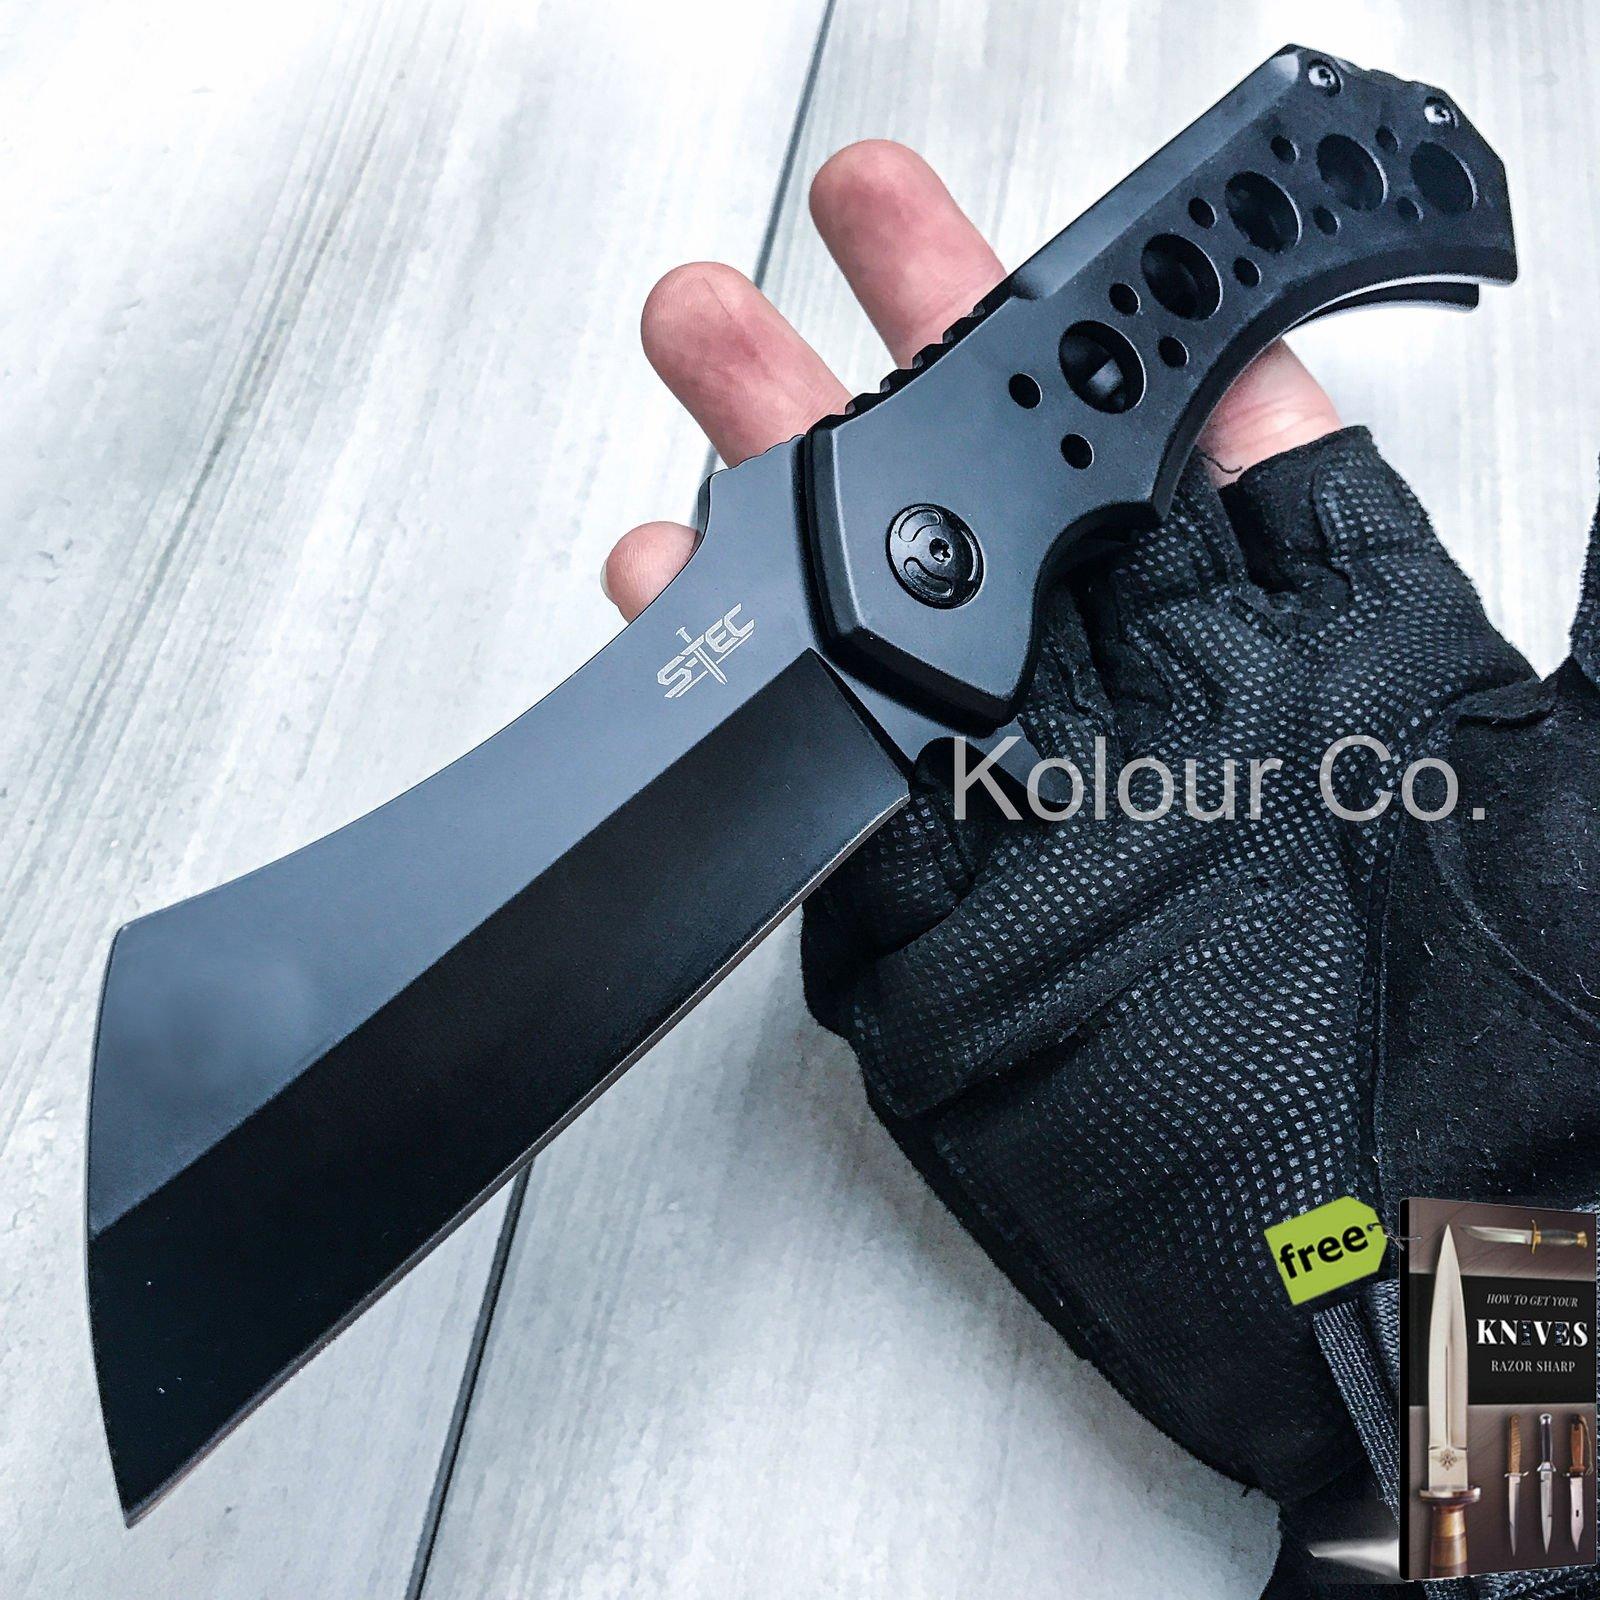 10'' HUGE CLEAVER BALL BEARING Assisted Open Pocket Folding Carbon Steel Razor Sharp Knife RAZOR Blade + eBook by SURVIVAL STEEL